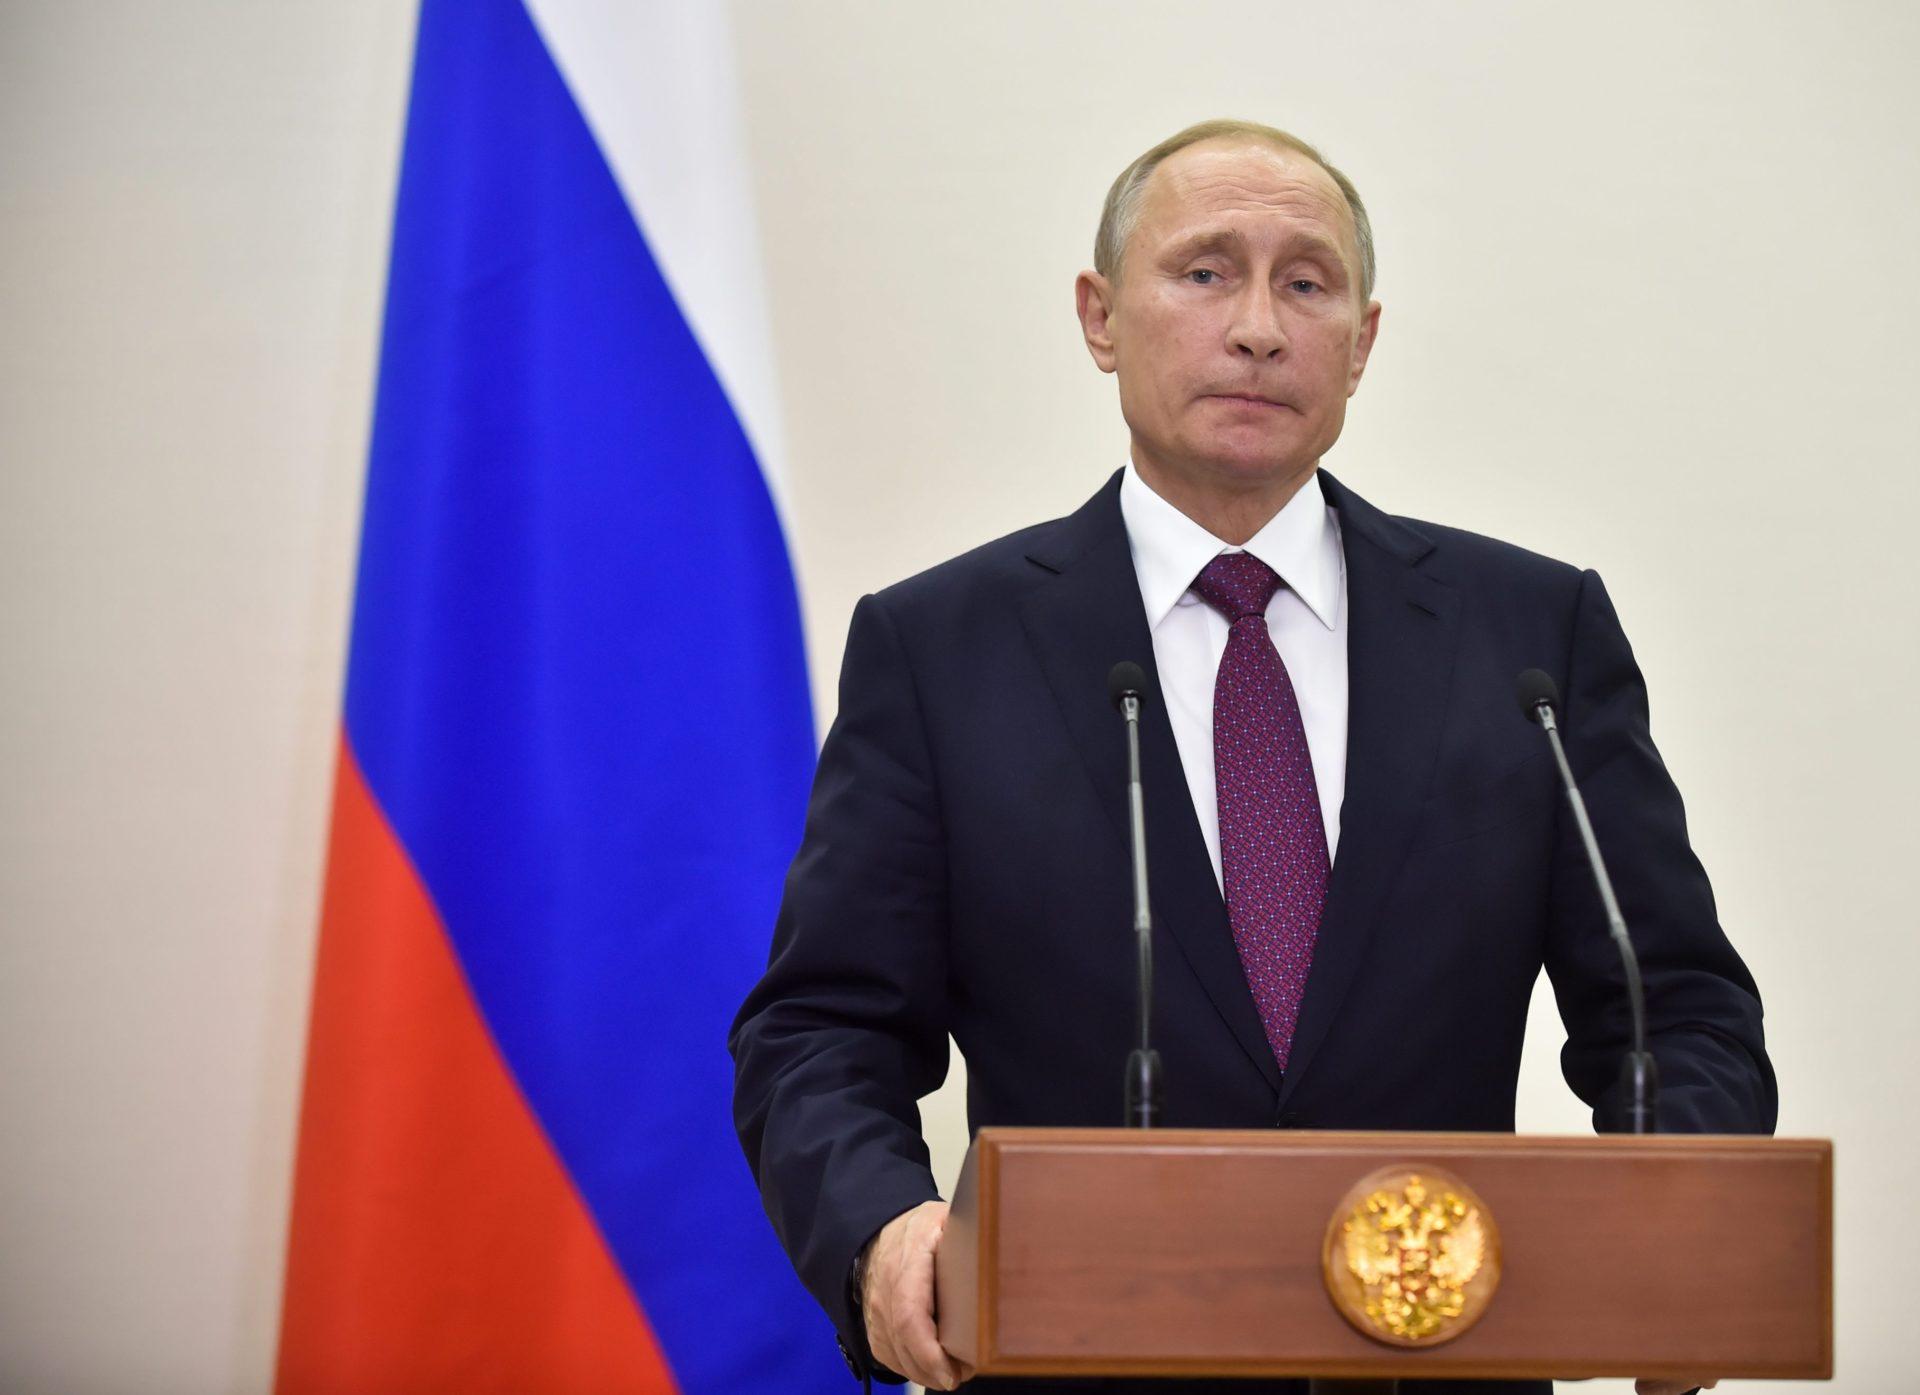 vladimir-putin-russia-efe-bbv